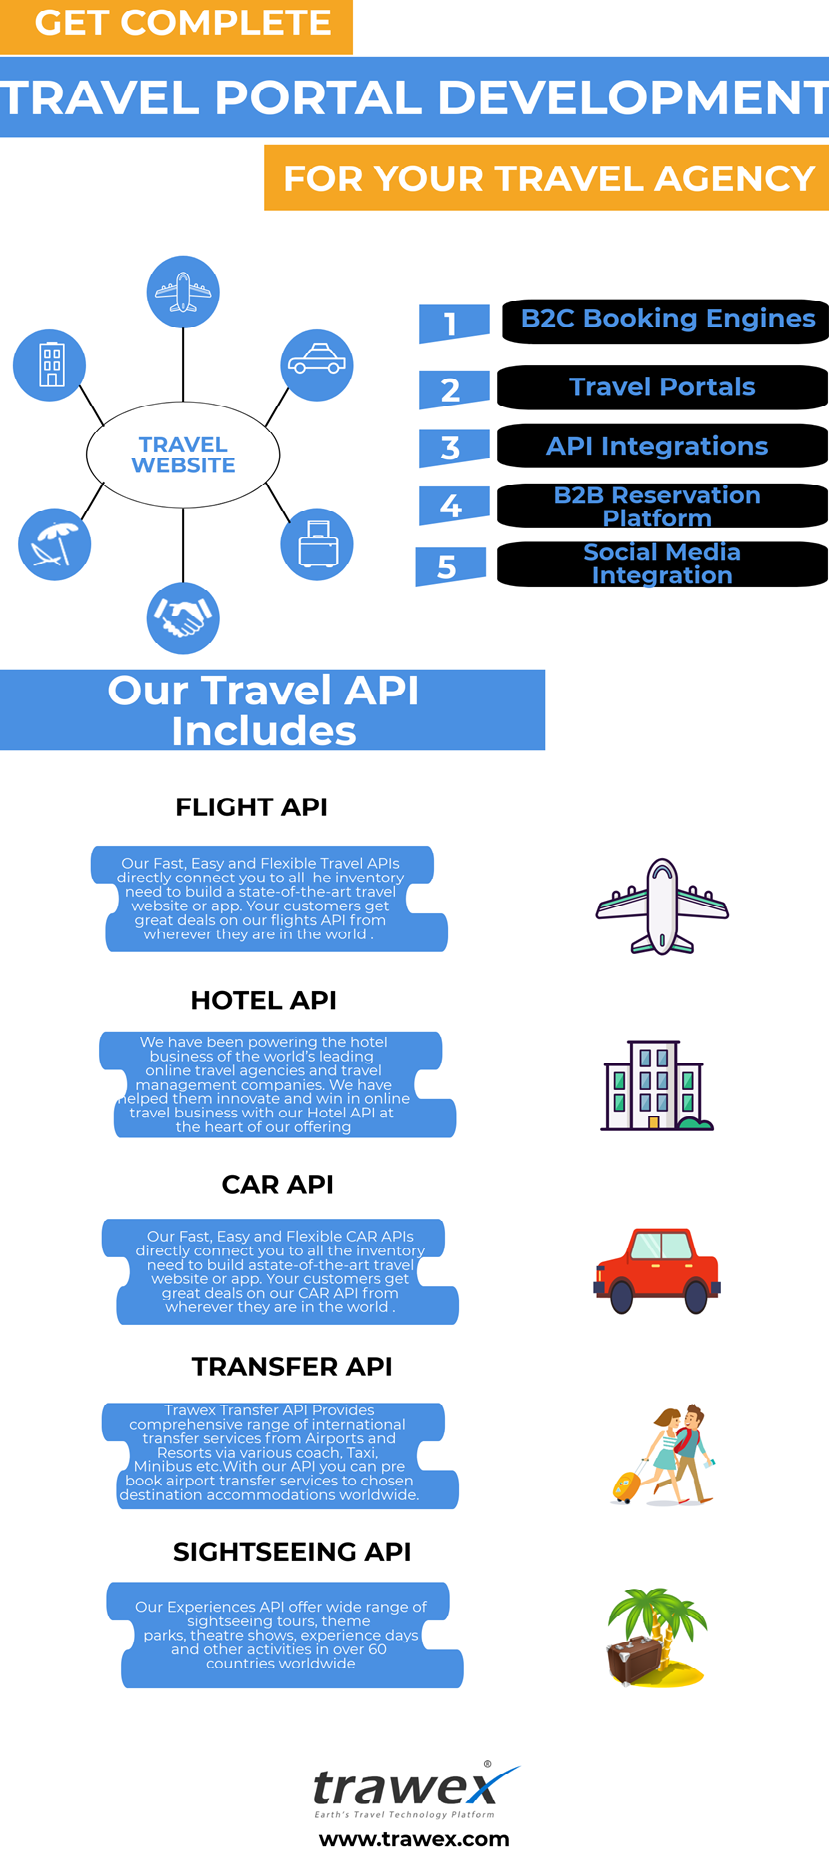 Trawex Provides Travel Xml Api Integration For Travel Companies